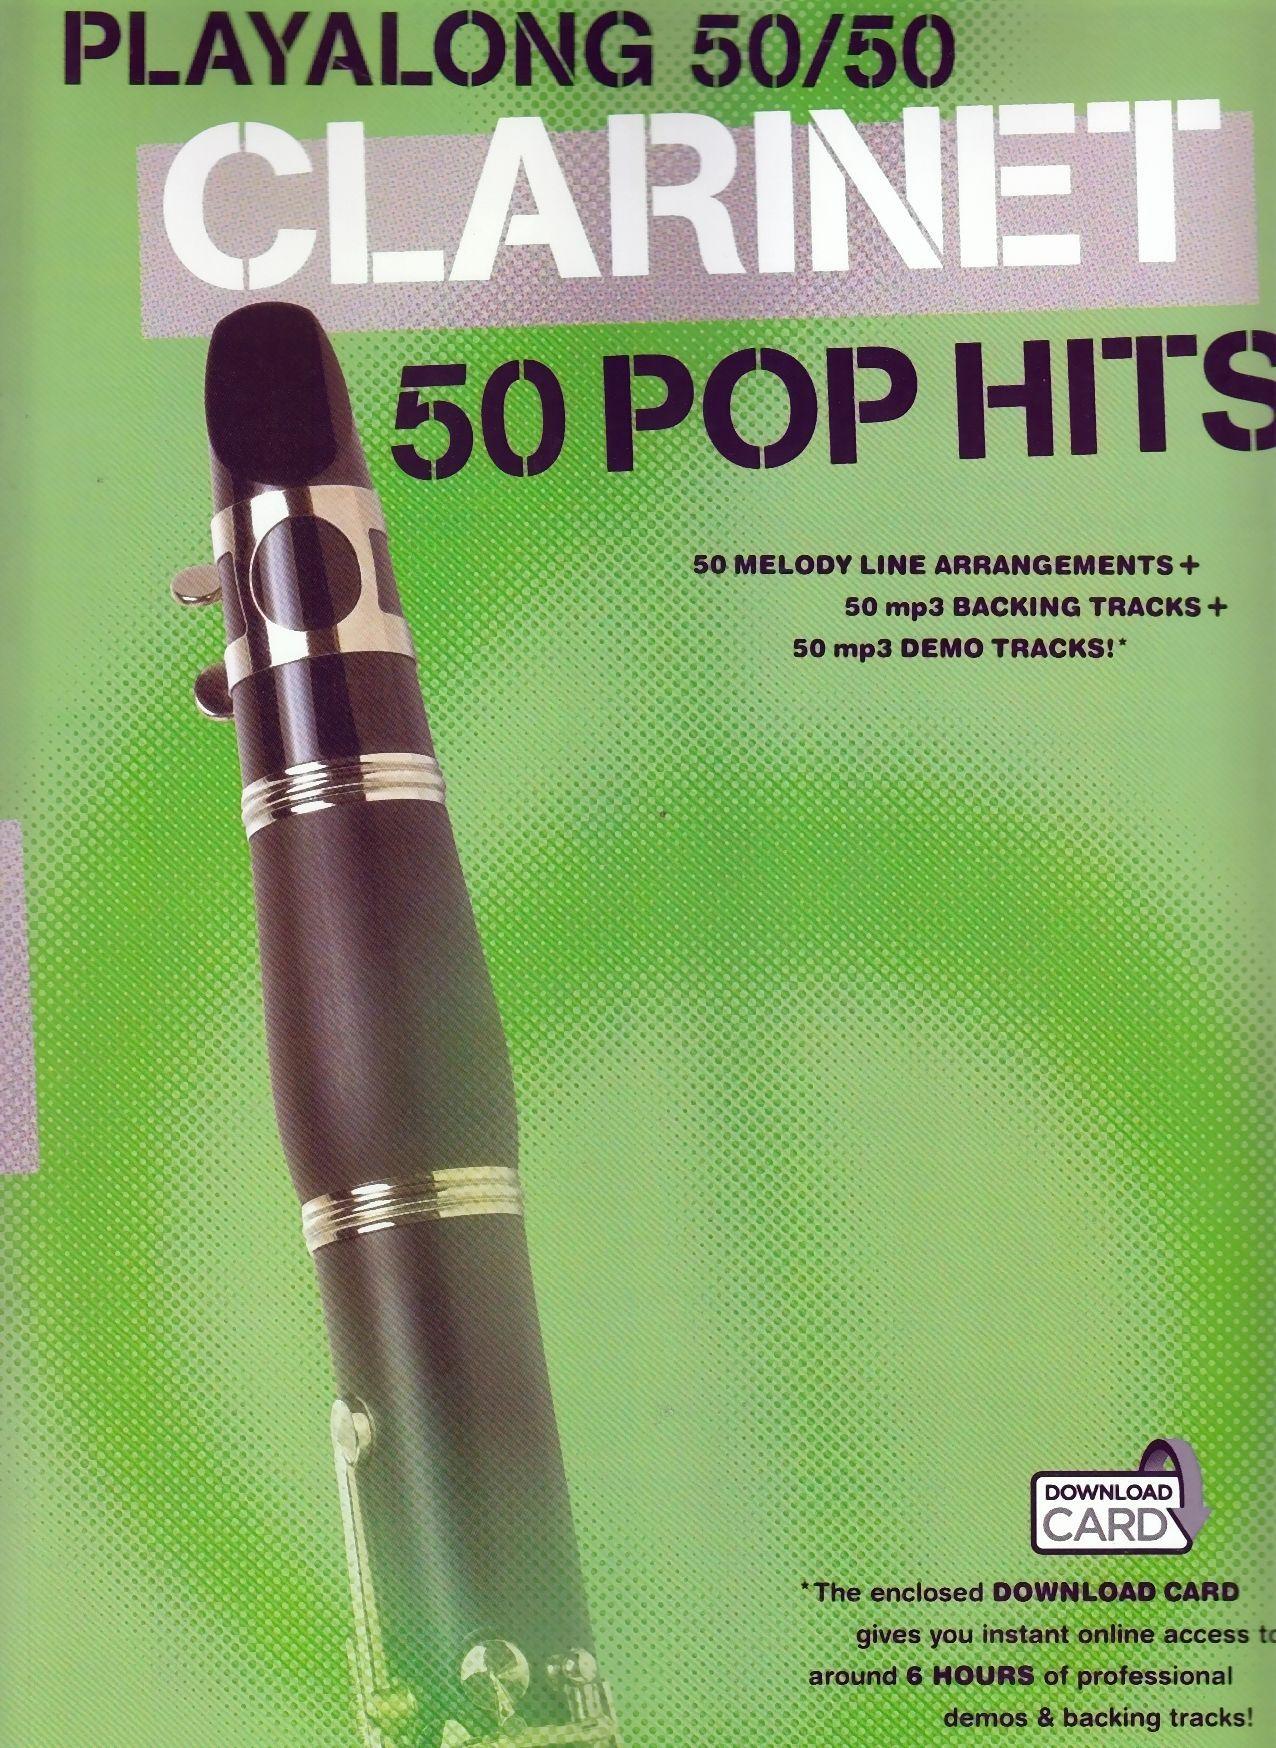 Noten Klarinette Clarinet 50 Pop hits playalong incl. downloadcard MSAM 1006478